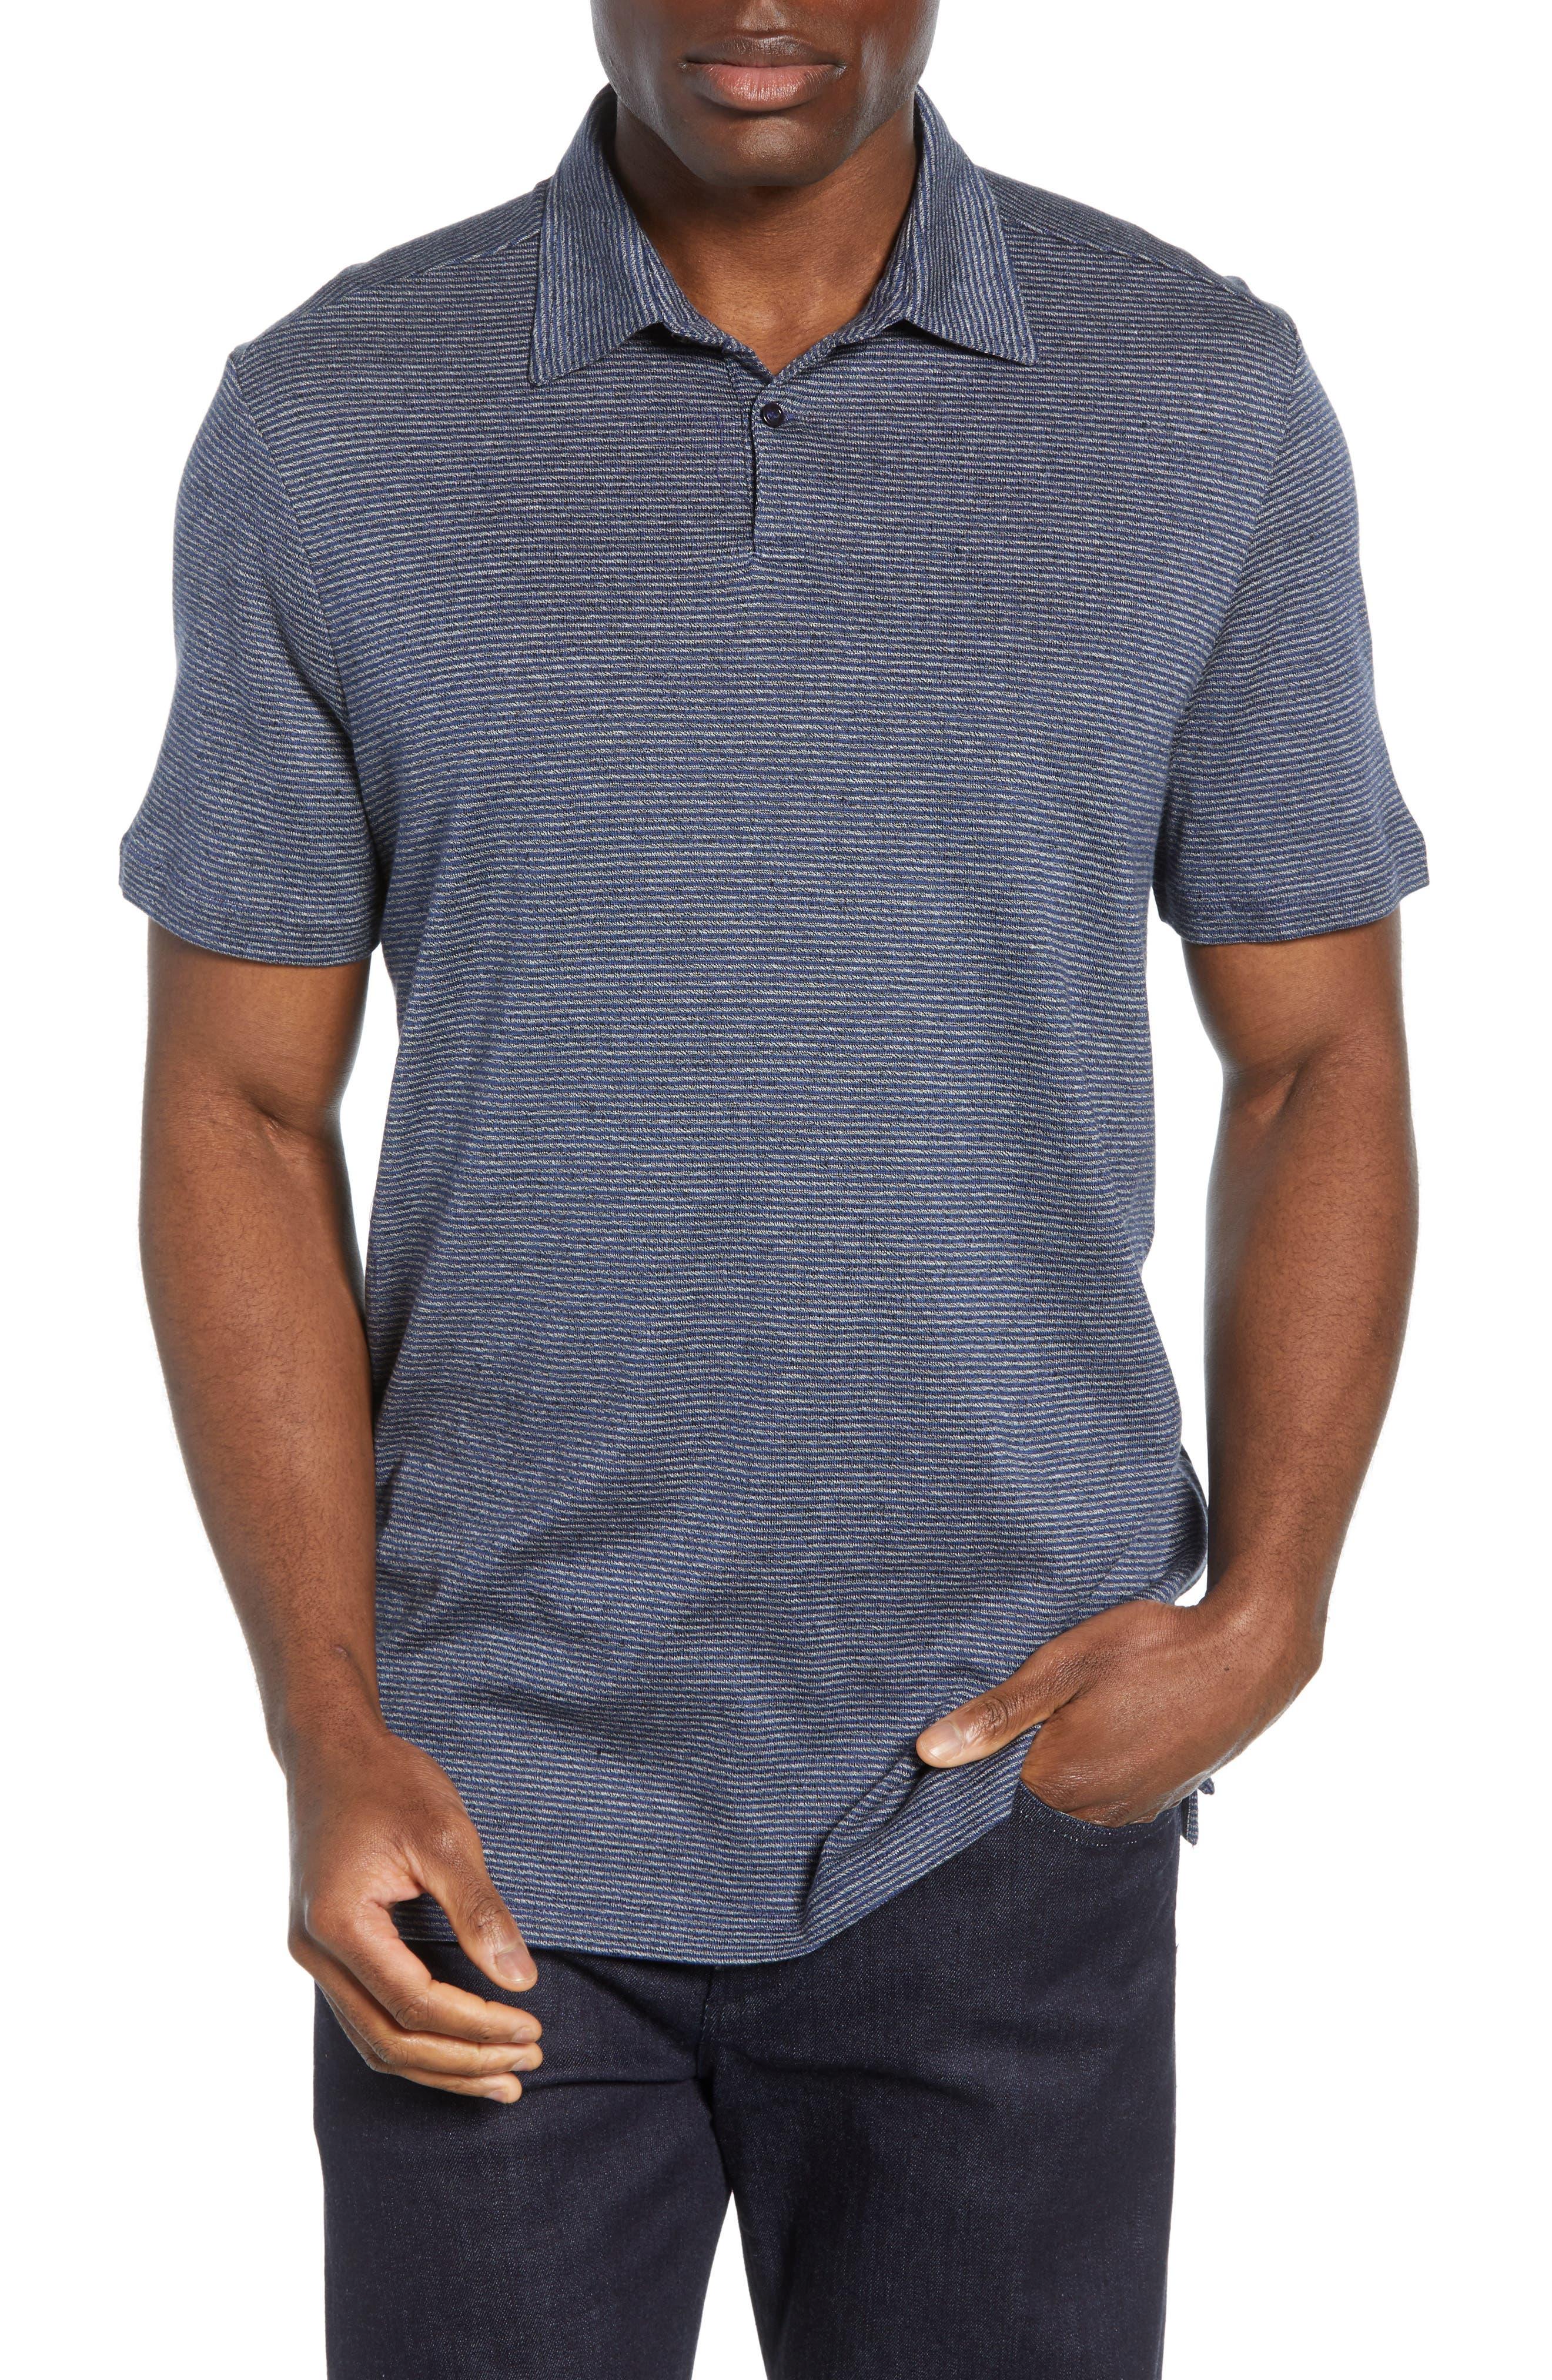 Nordstrom Signature Stripe Cotton & Linen Polo Shirt